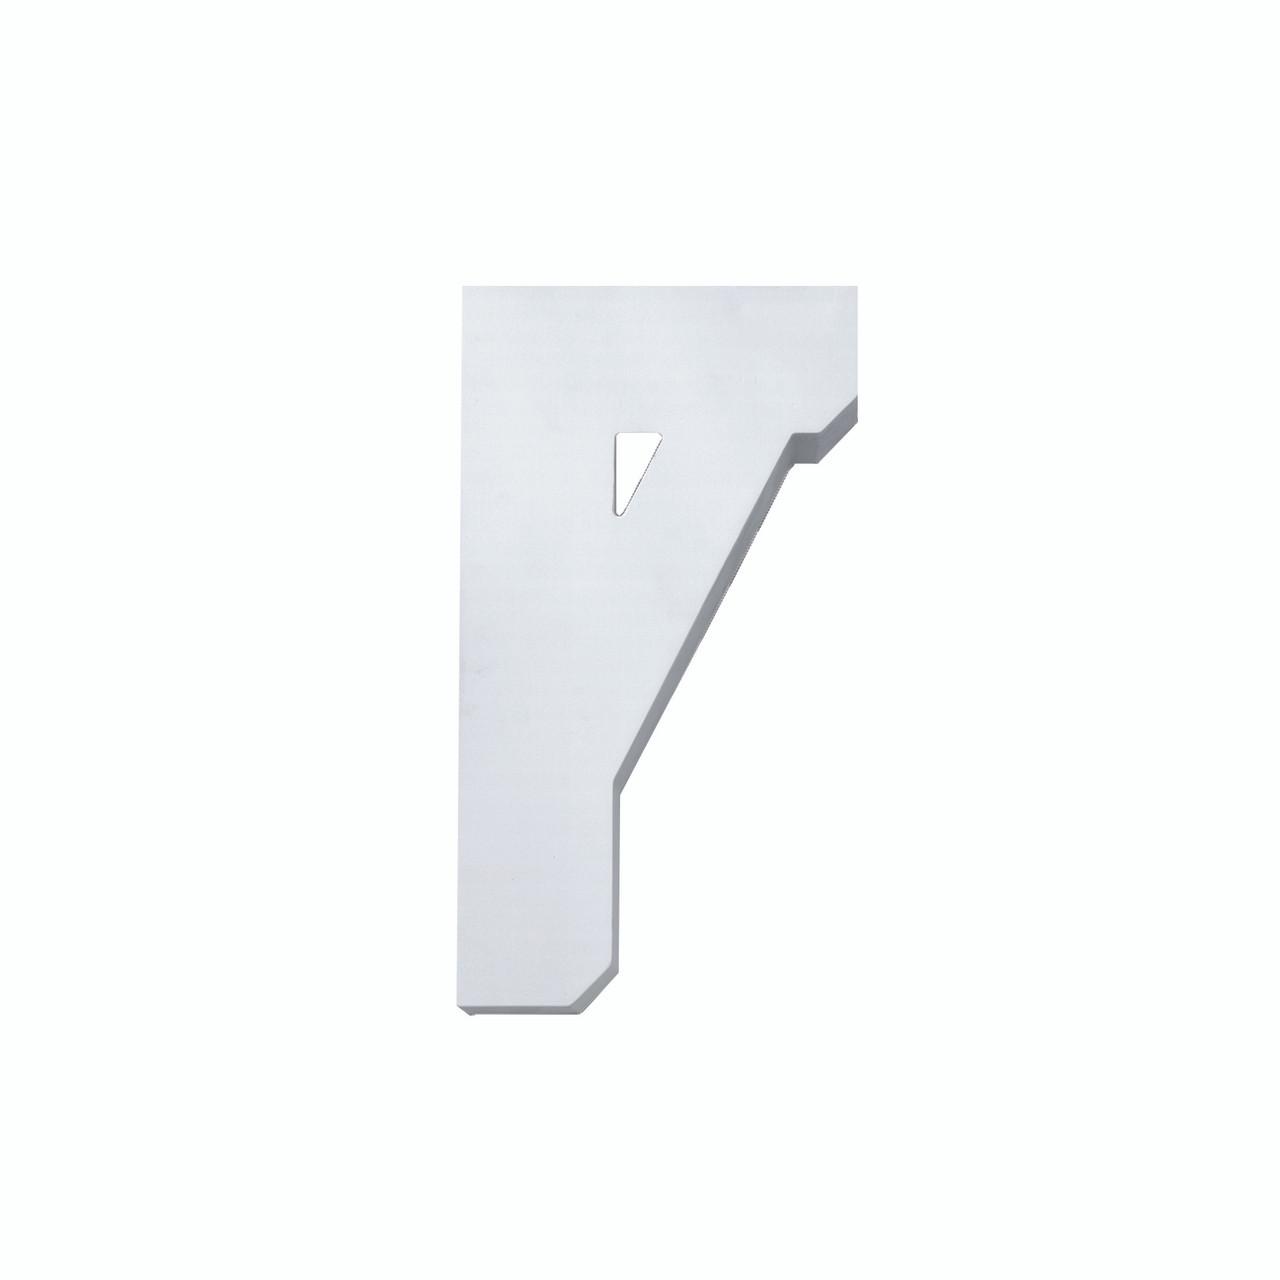 Bkt11x20 for Fypon quick rail